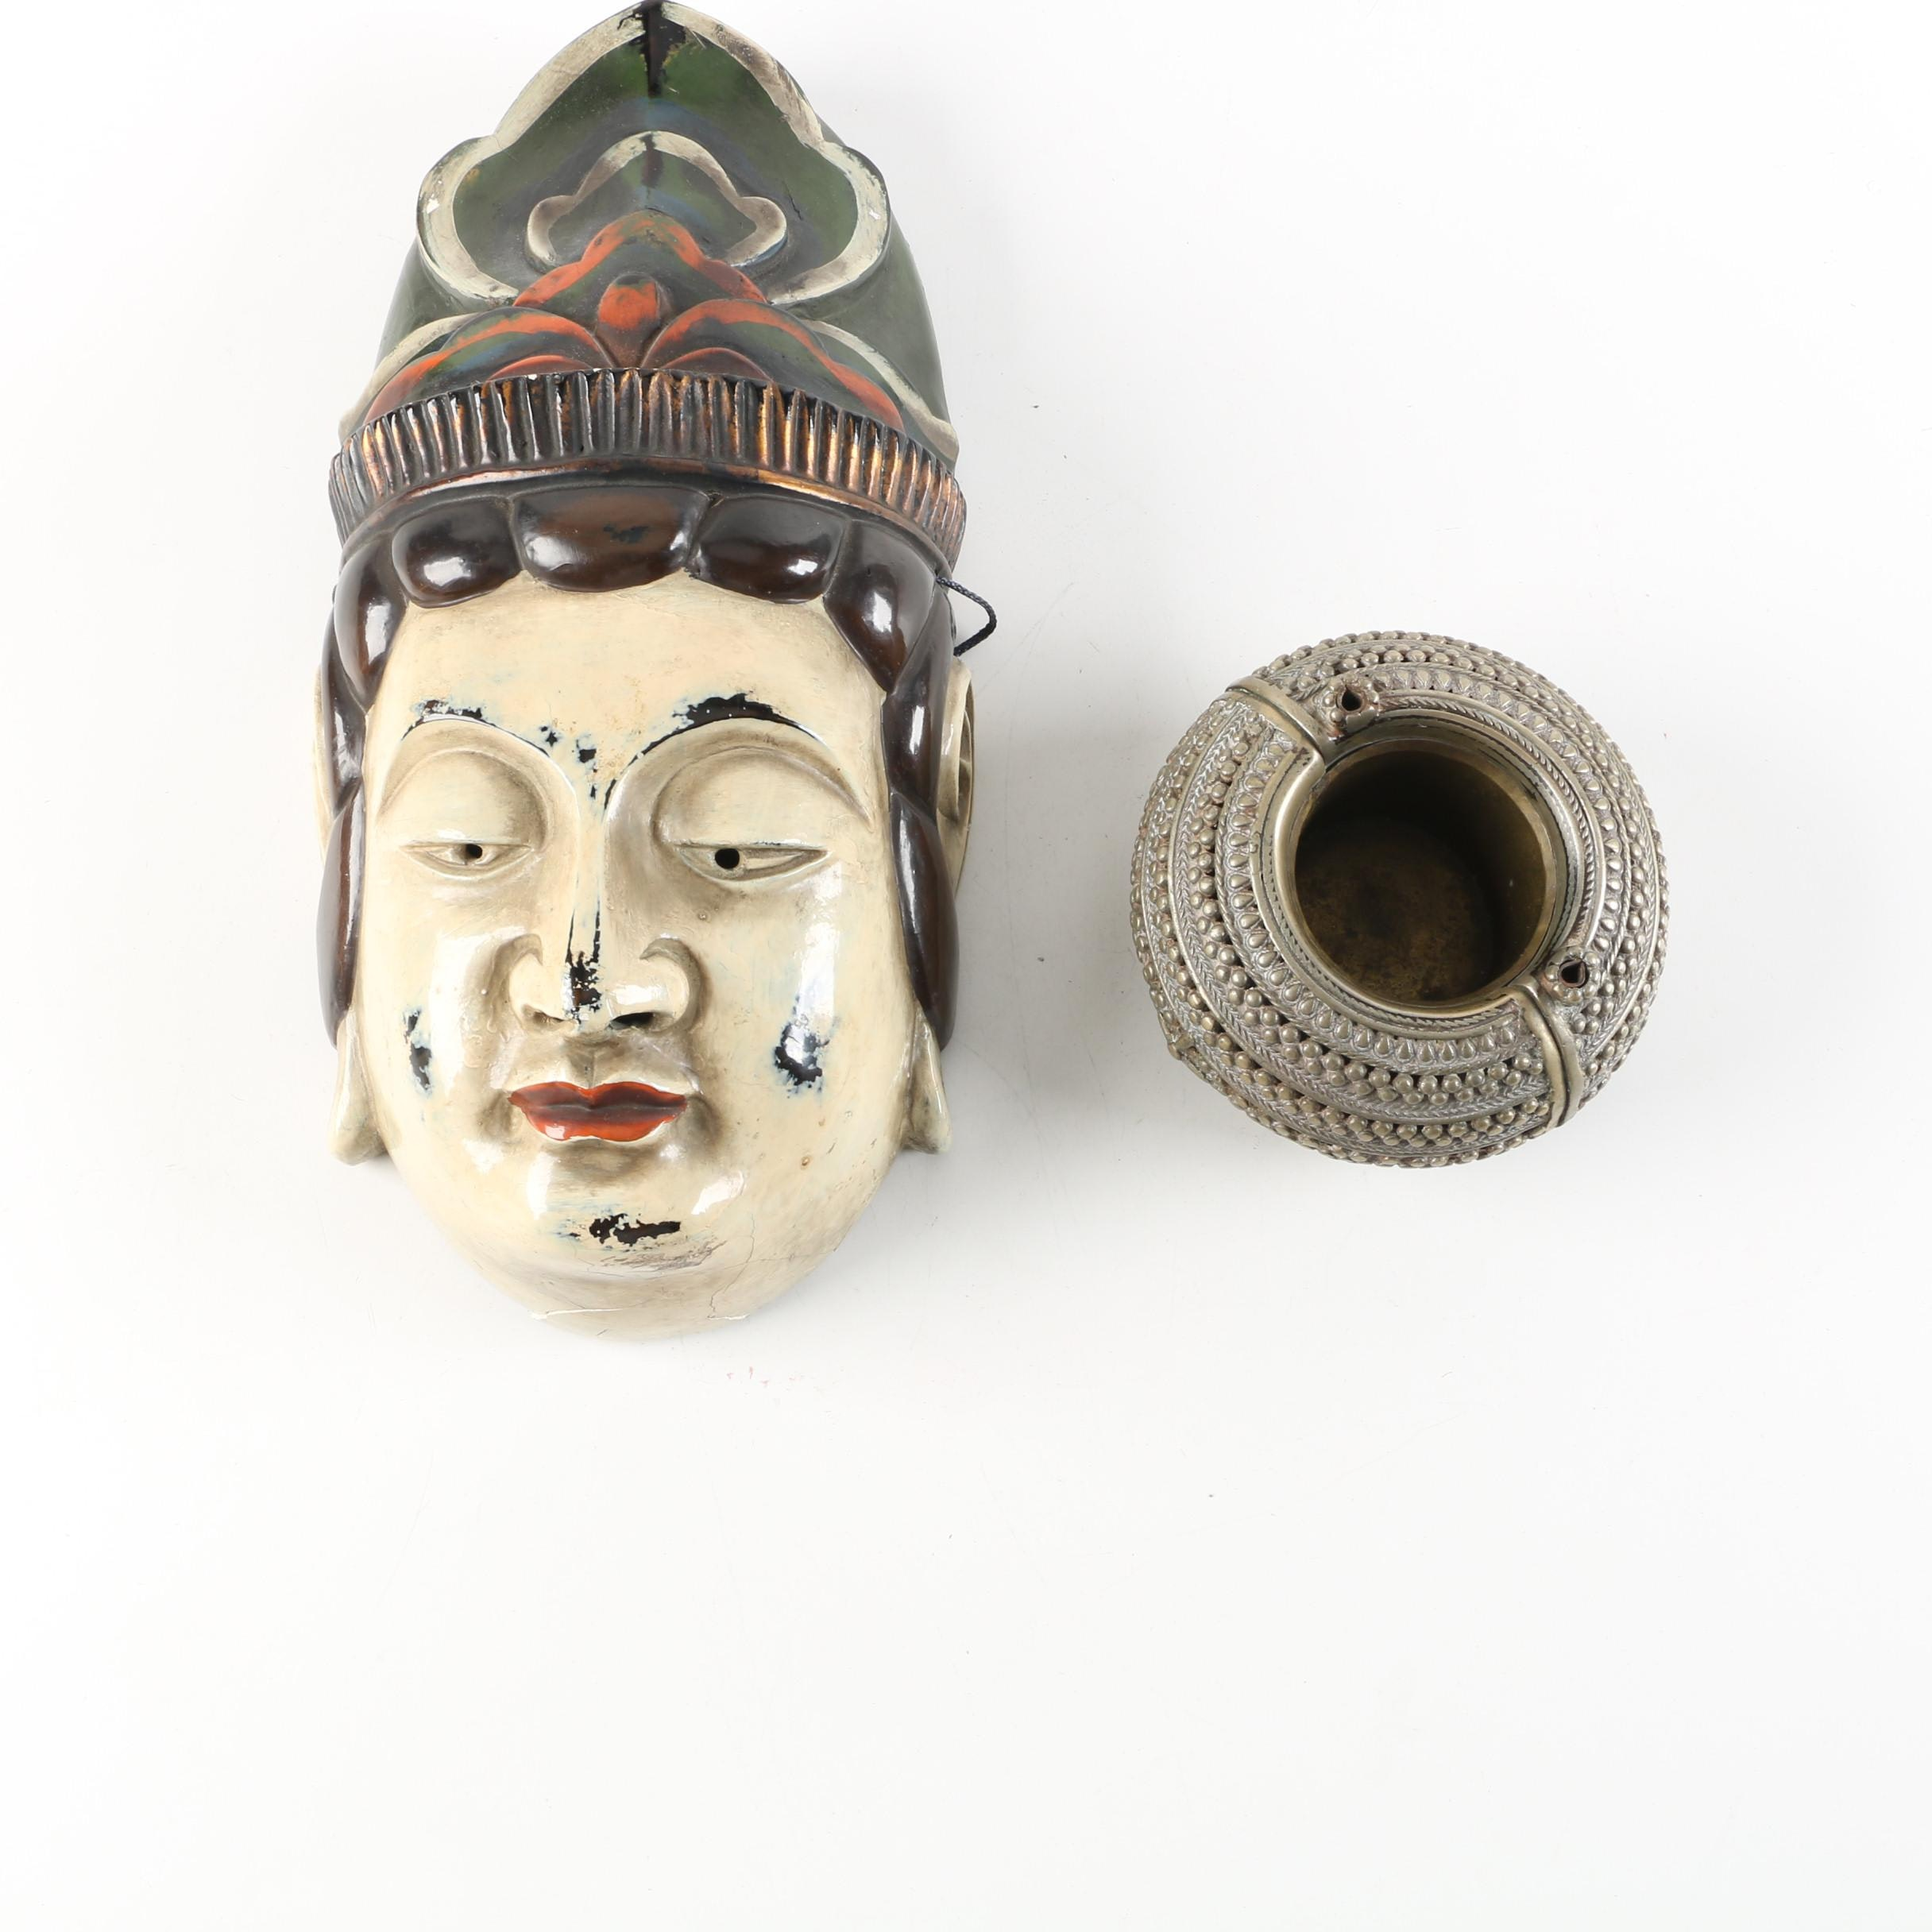 Japanese Papier-mâché Mask and Votive Holder